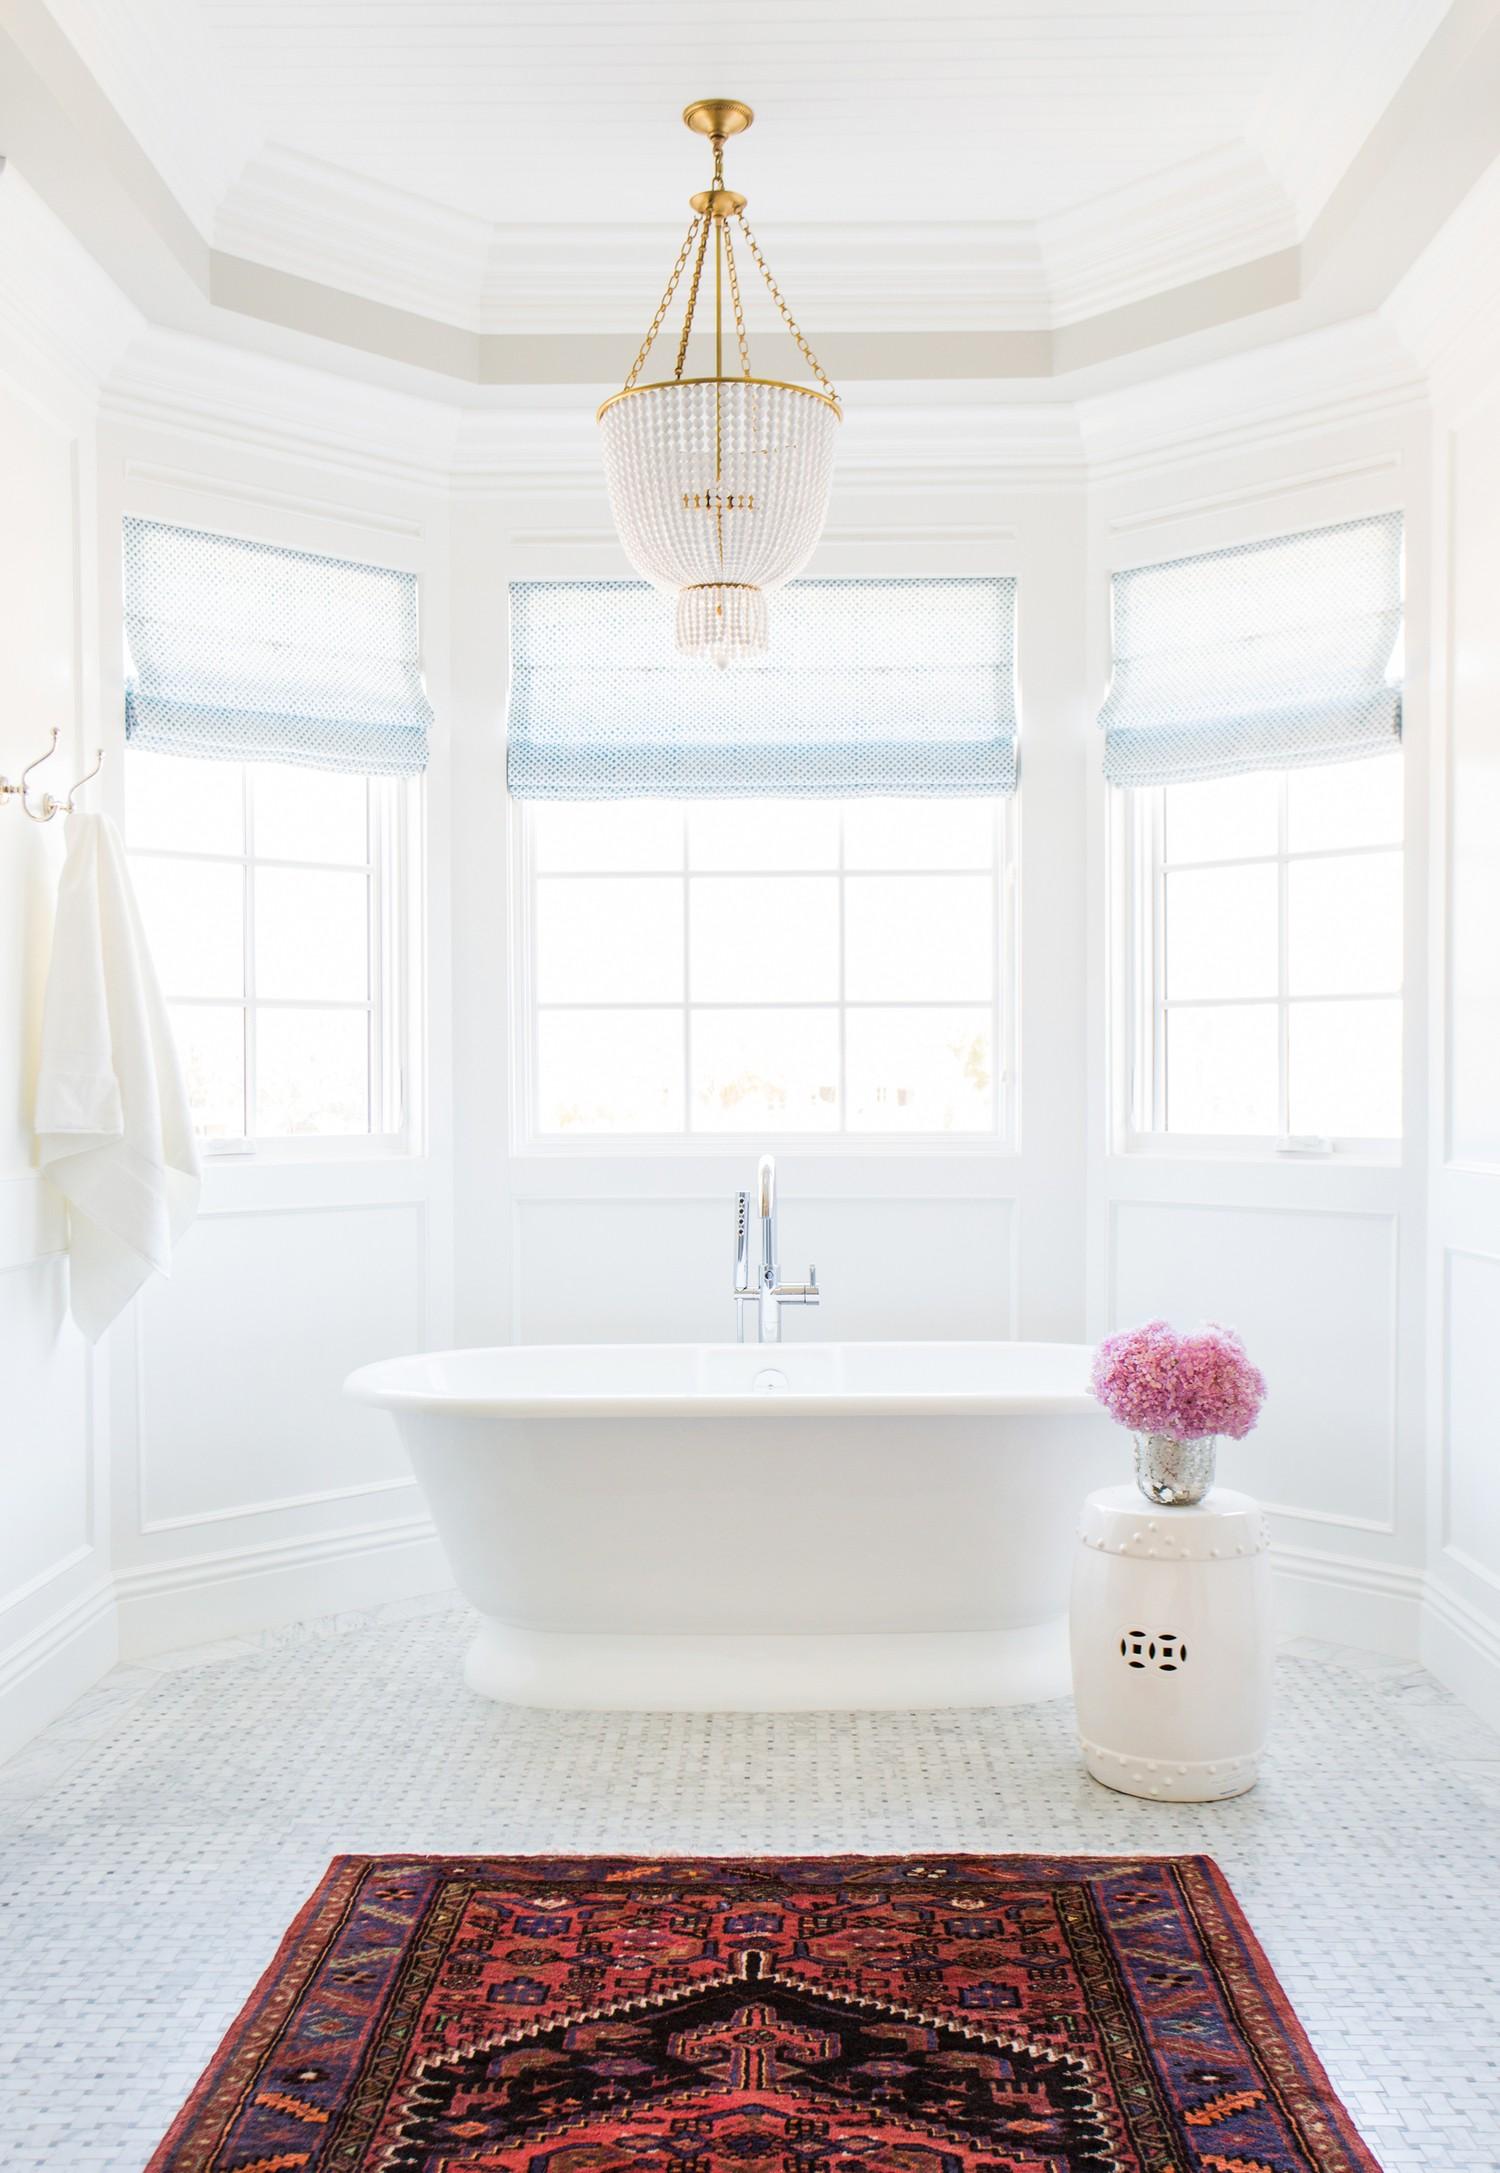 Marble+basketweave+tile,+Persian+Rug+in+the+bathroom+and+chandelier+over+tub+__+Studio+McGee.jpg